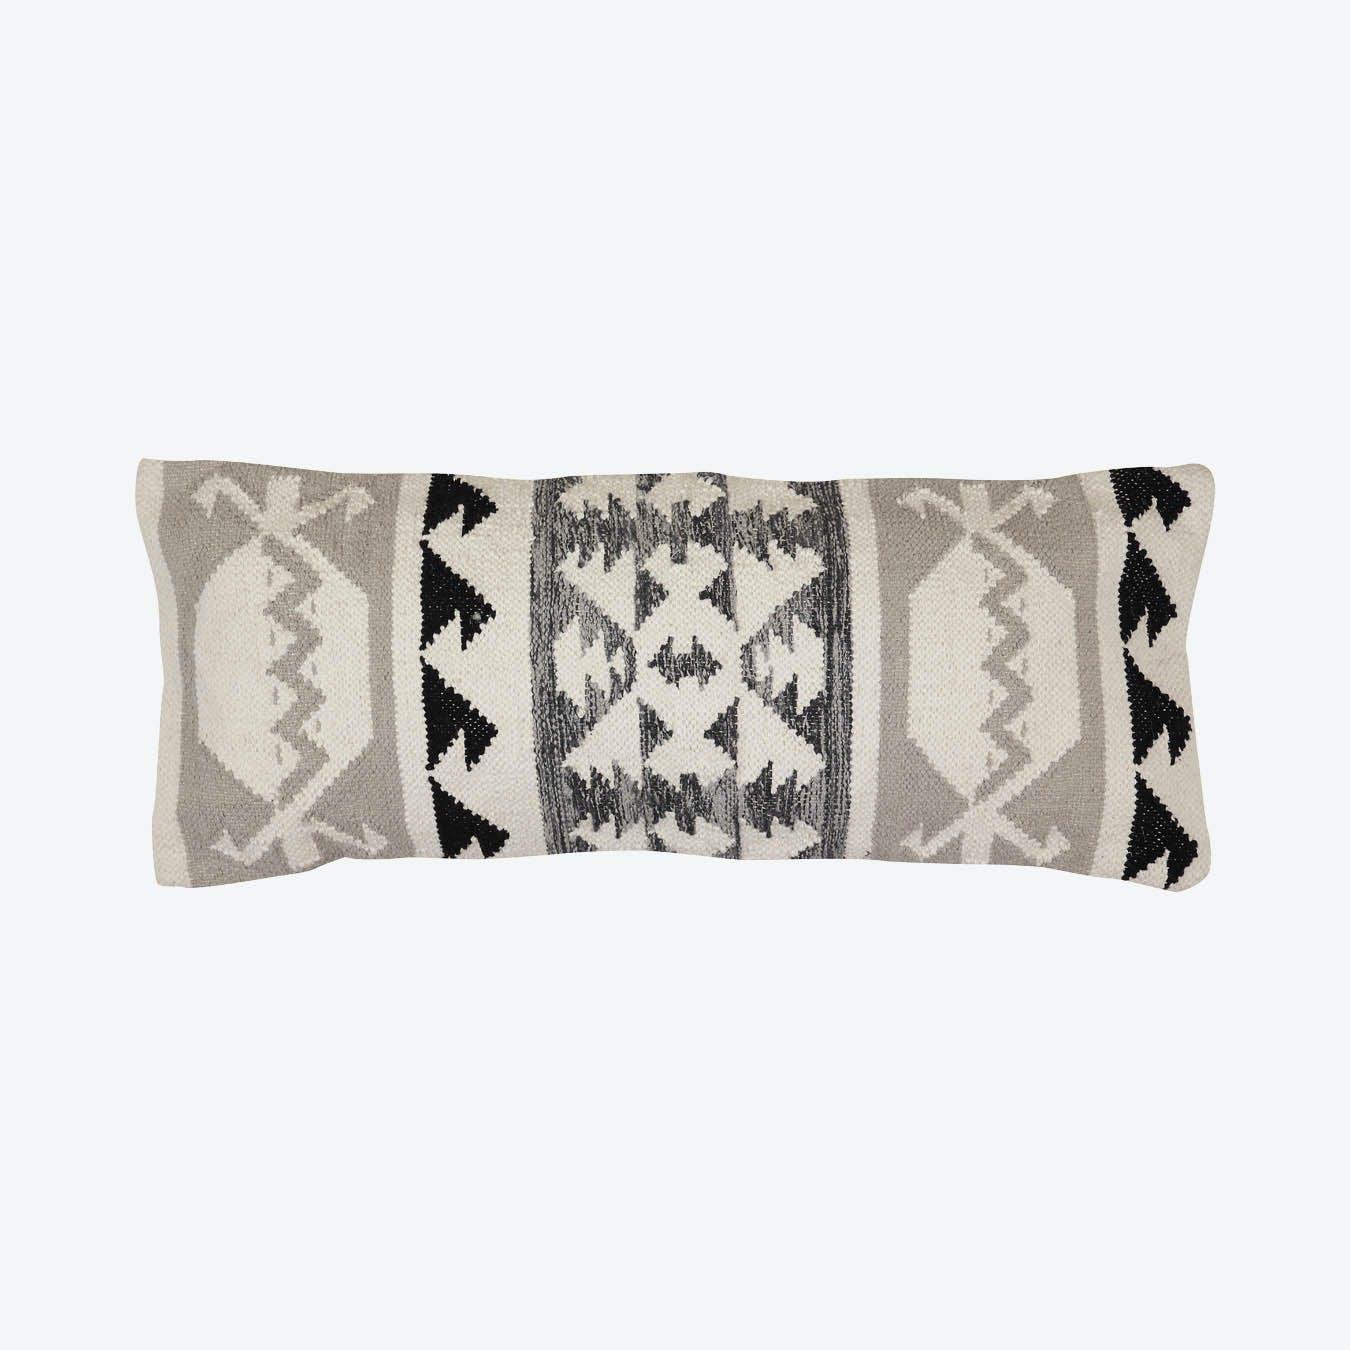 Tulum Kilim Lumbar Pillow Cover Black